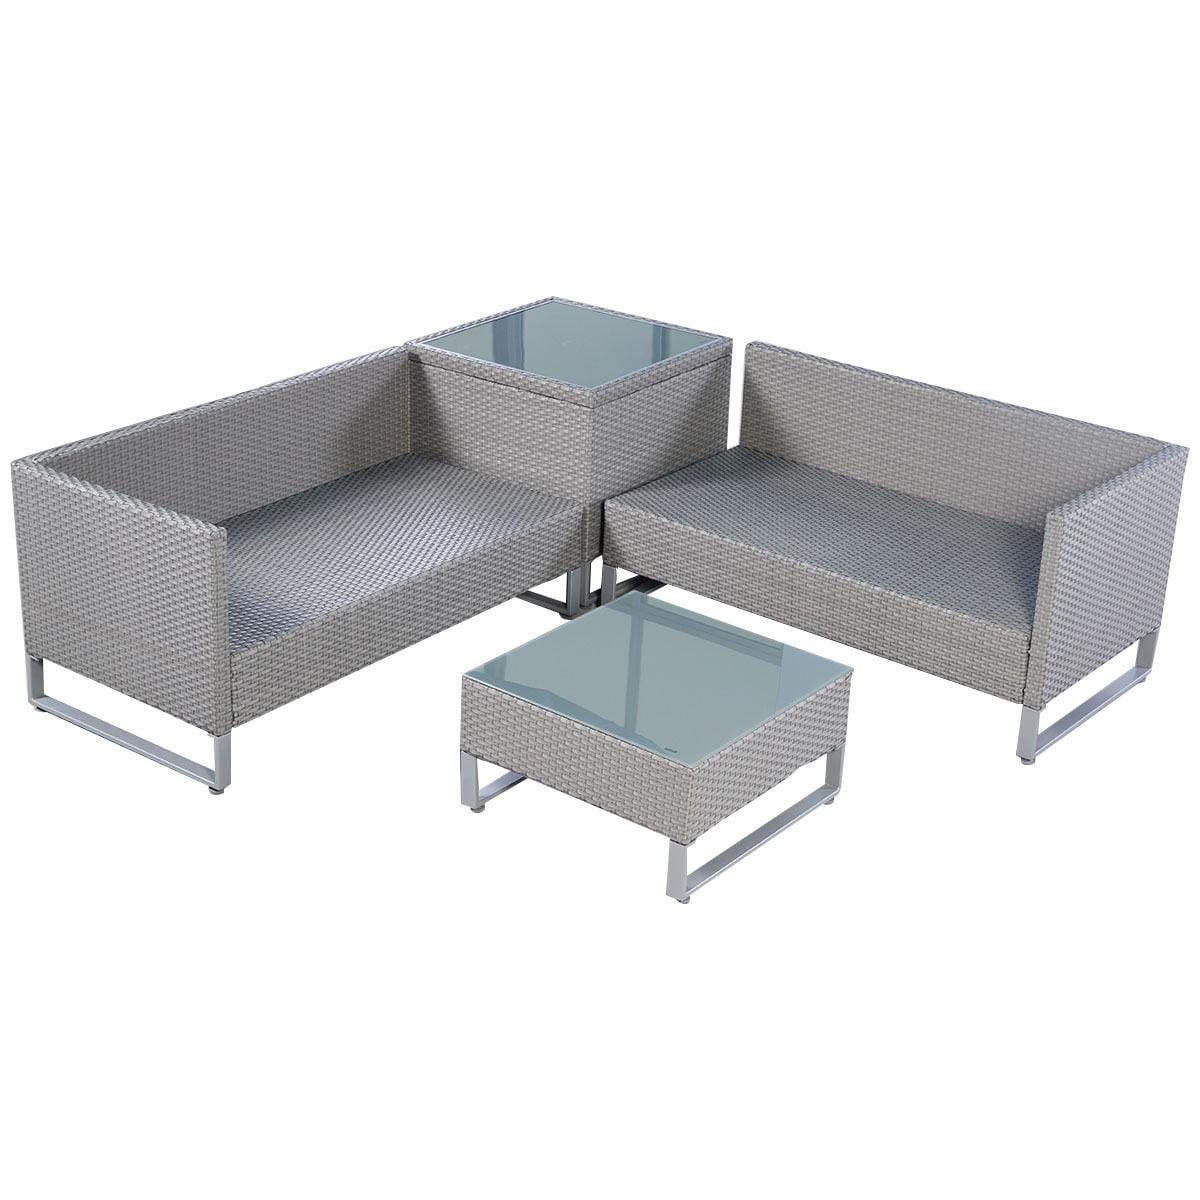 Costway 4PCS Gray Rattan Wicker Patio Sofa Cushion Seat Set